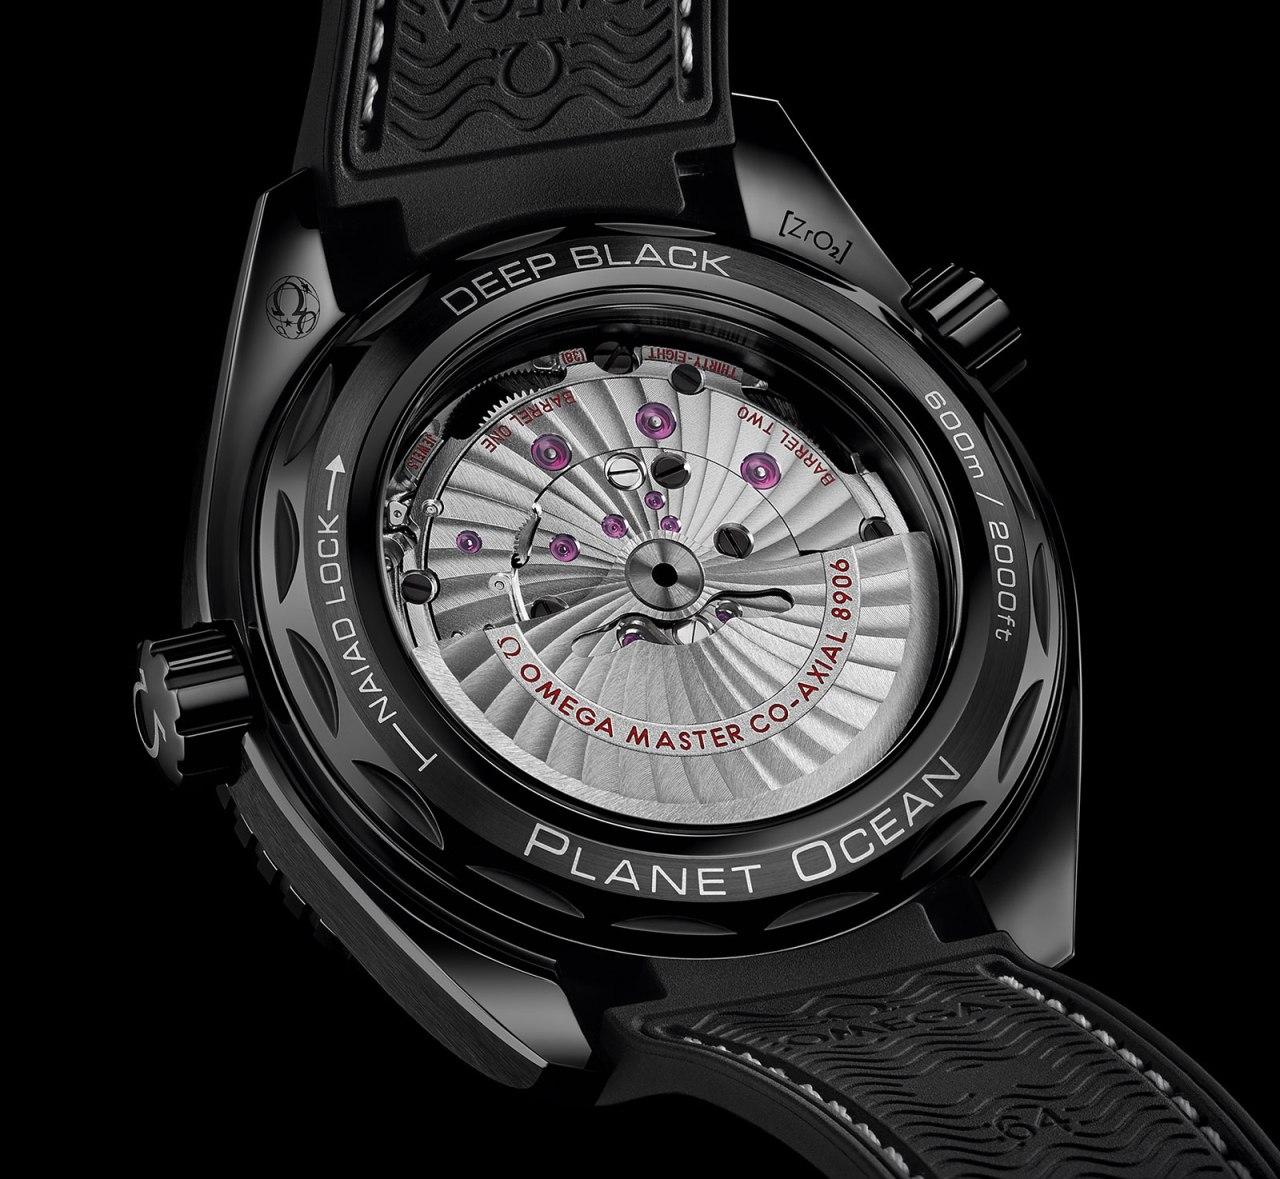 Omega-Seamaster-Planet-Ocean-Deep-Black-Ceramic-2